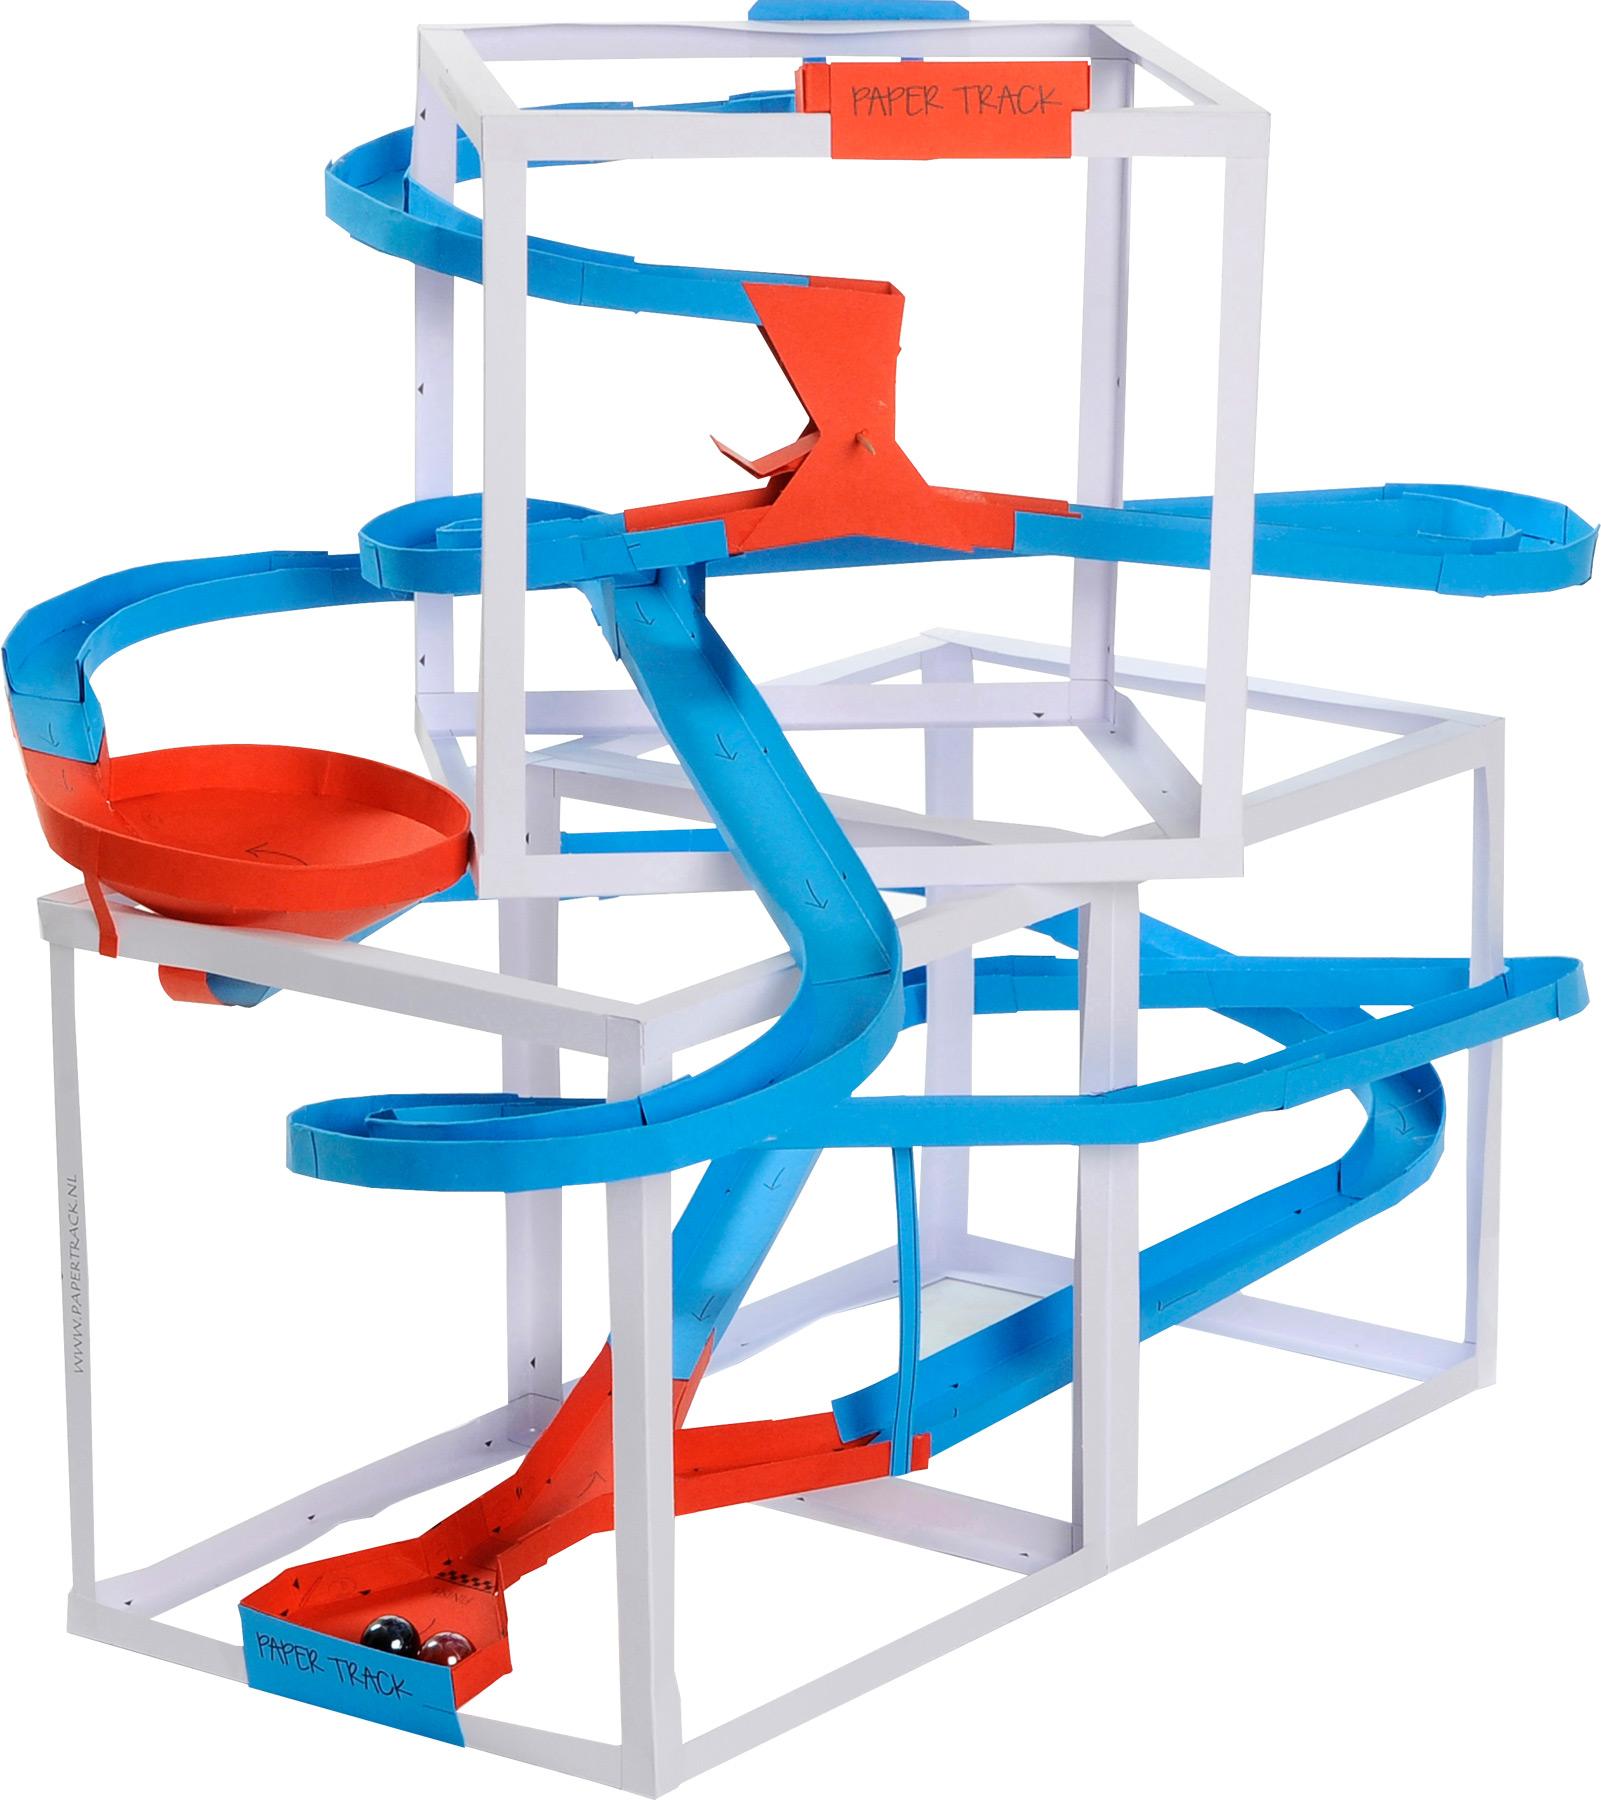 murmelbahn papertrack kugelbahn kinder spielzeug 4 8 10 meter rolllbahn bausatz ebay. Black Bedroom Furniture Sets. Home Design Ideas